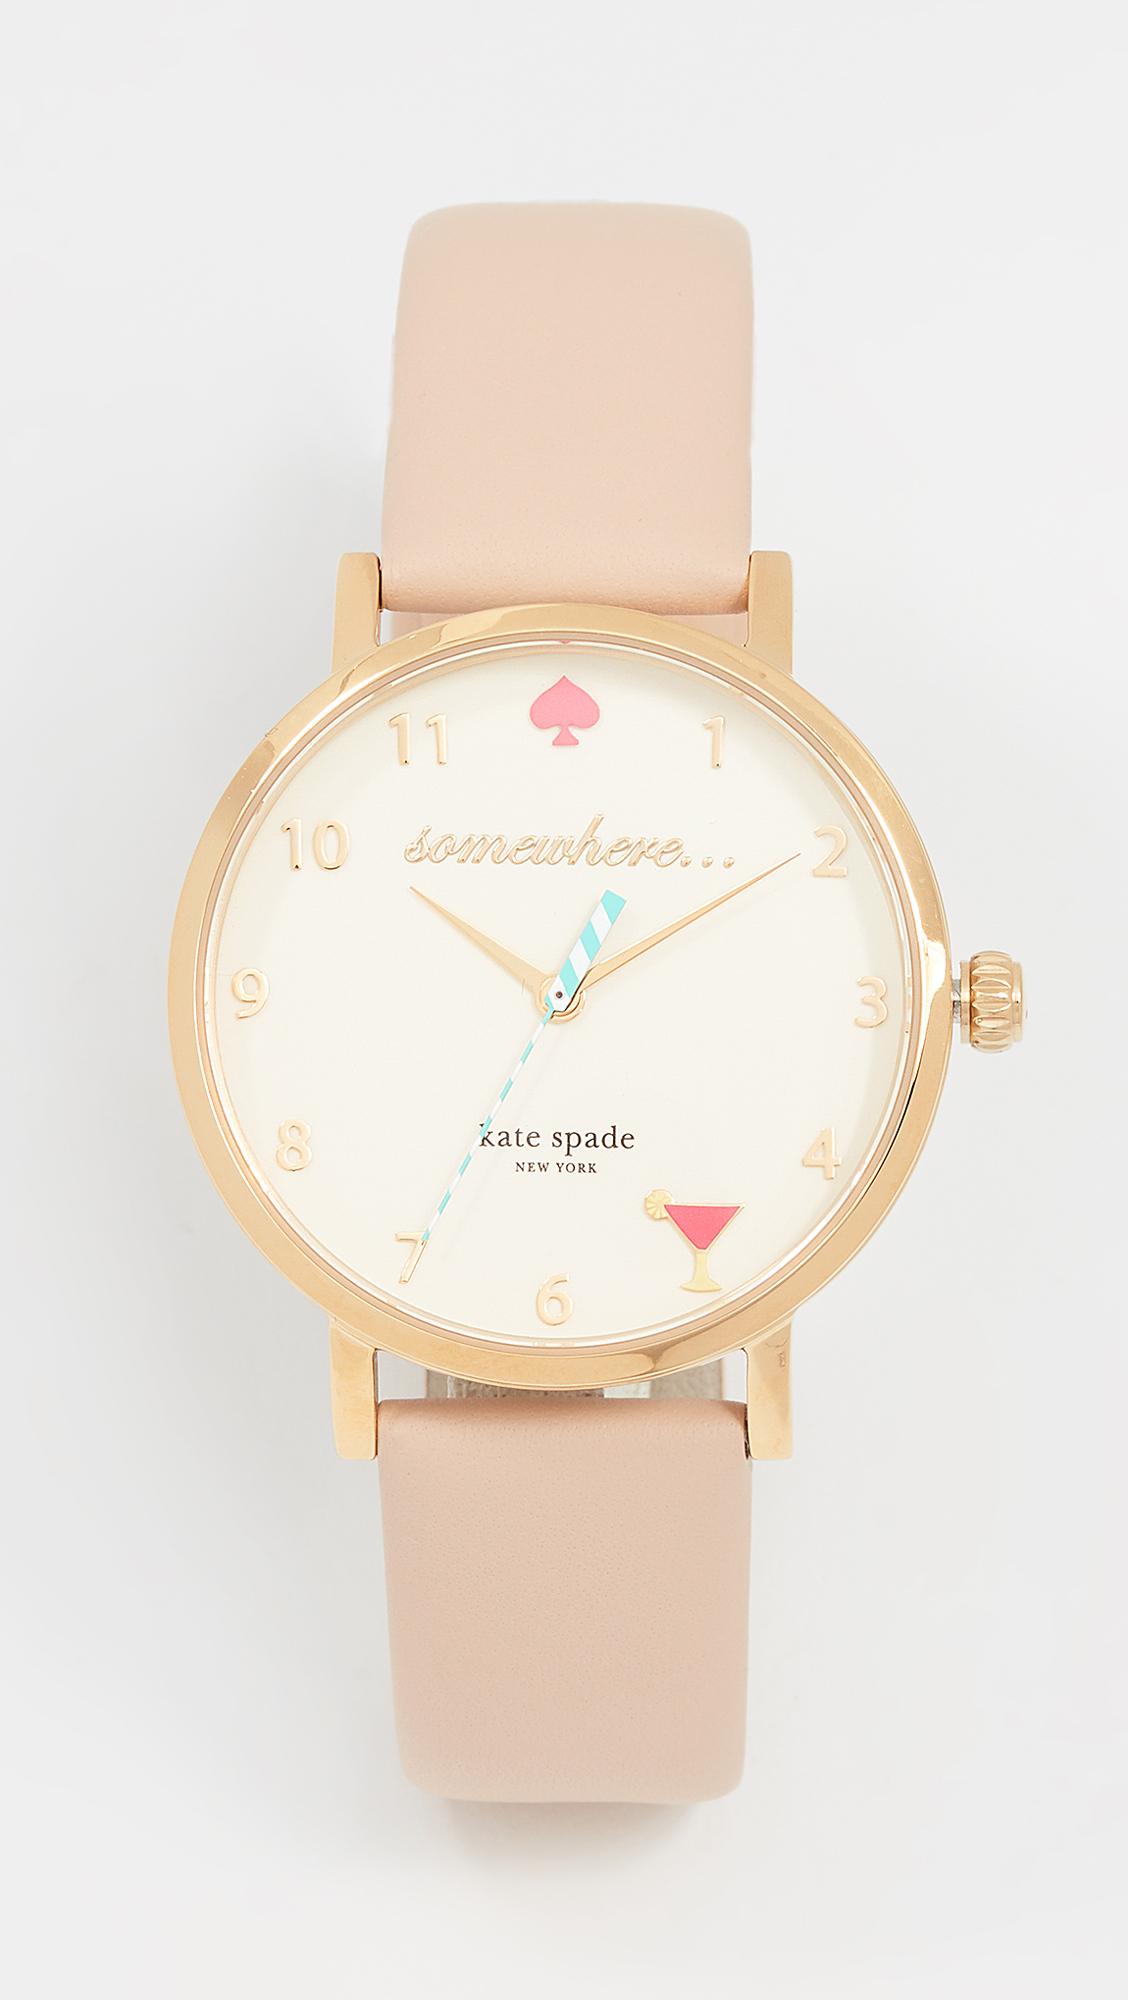 Kate Spade New York 5 OClock Metro Leather Watch - Vachetta/Gold